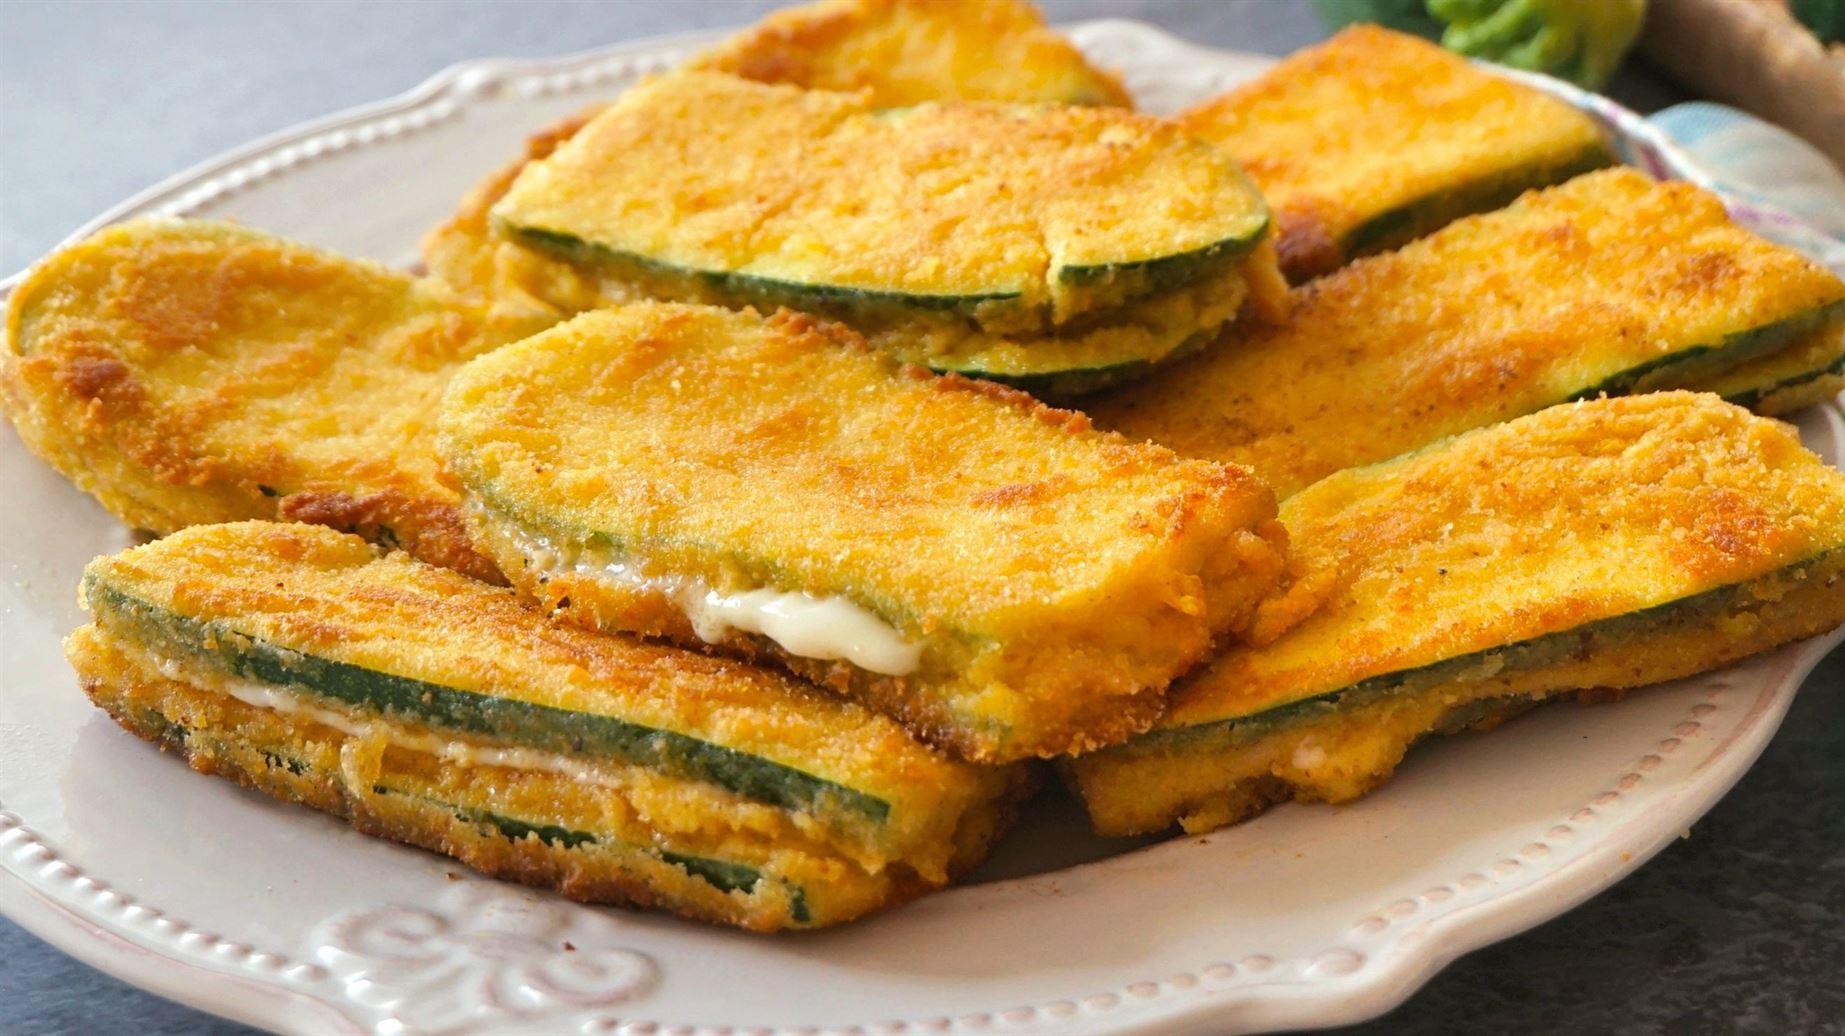 San jacobos de calabacín (zucchini). Te pedirán repetir una y otra vez